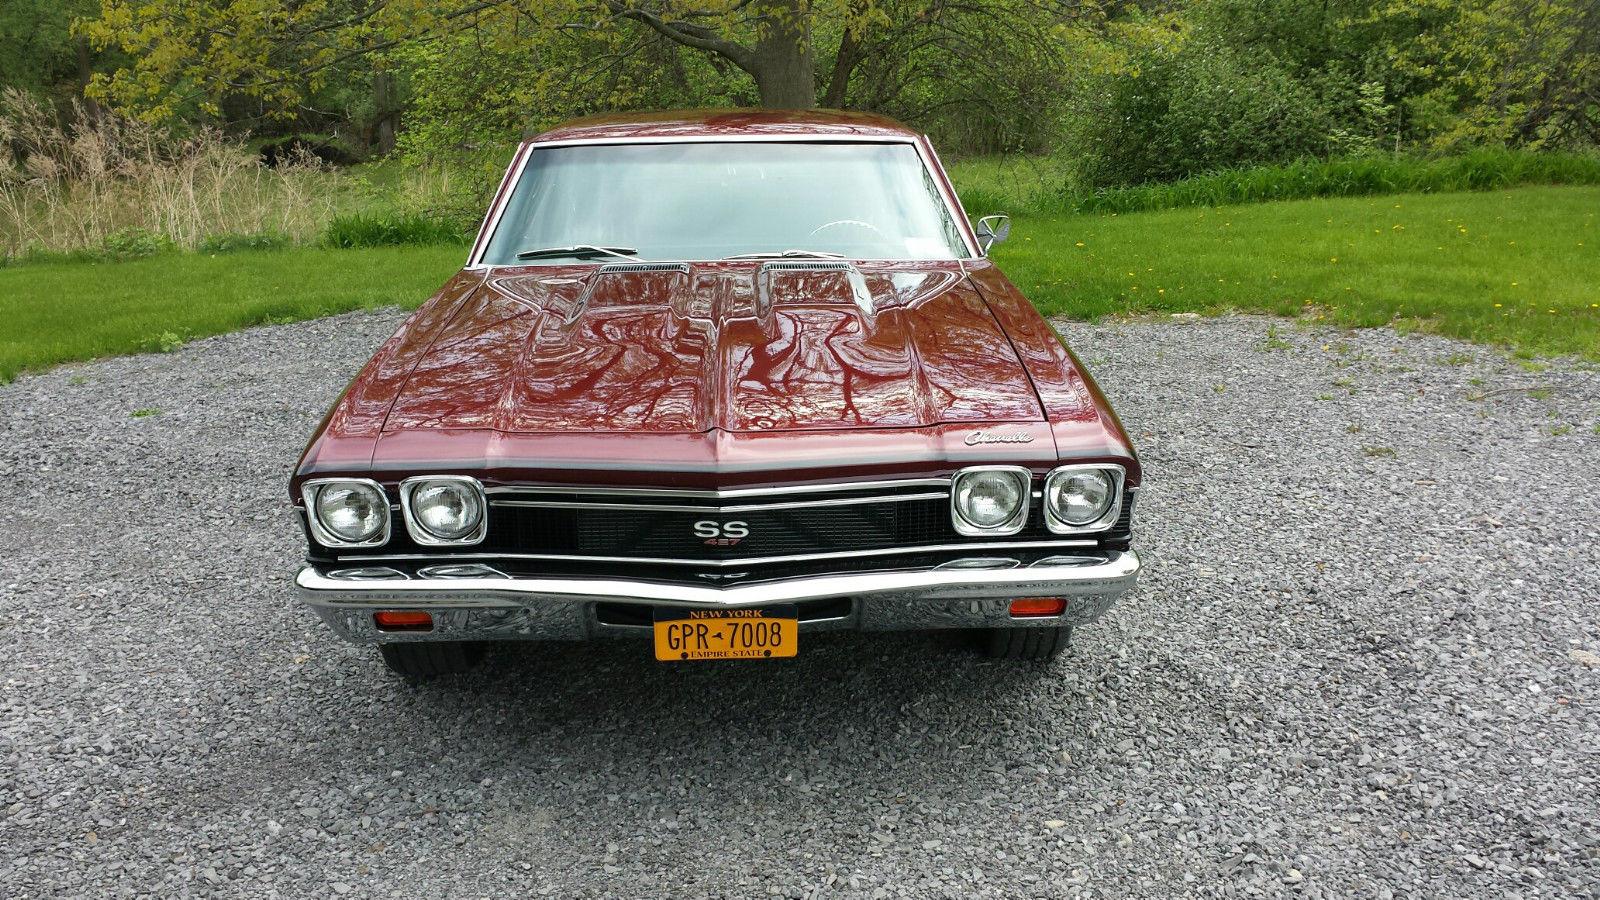 1968 Chevrolet Chevelle3